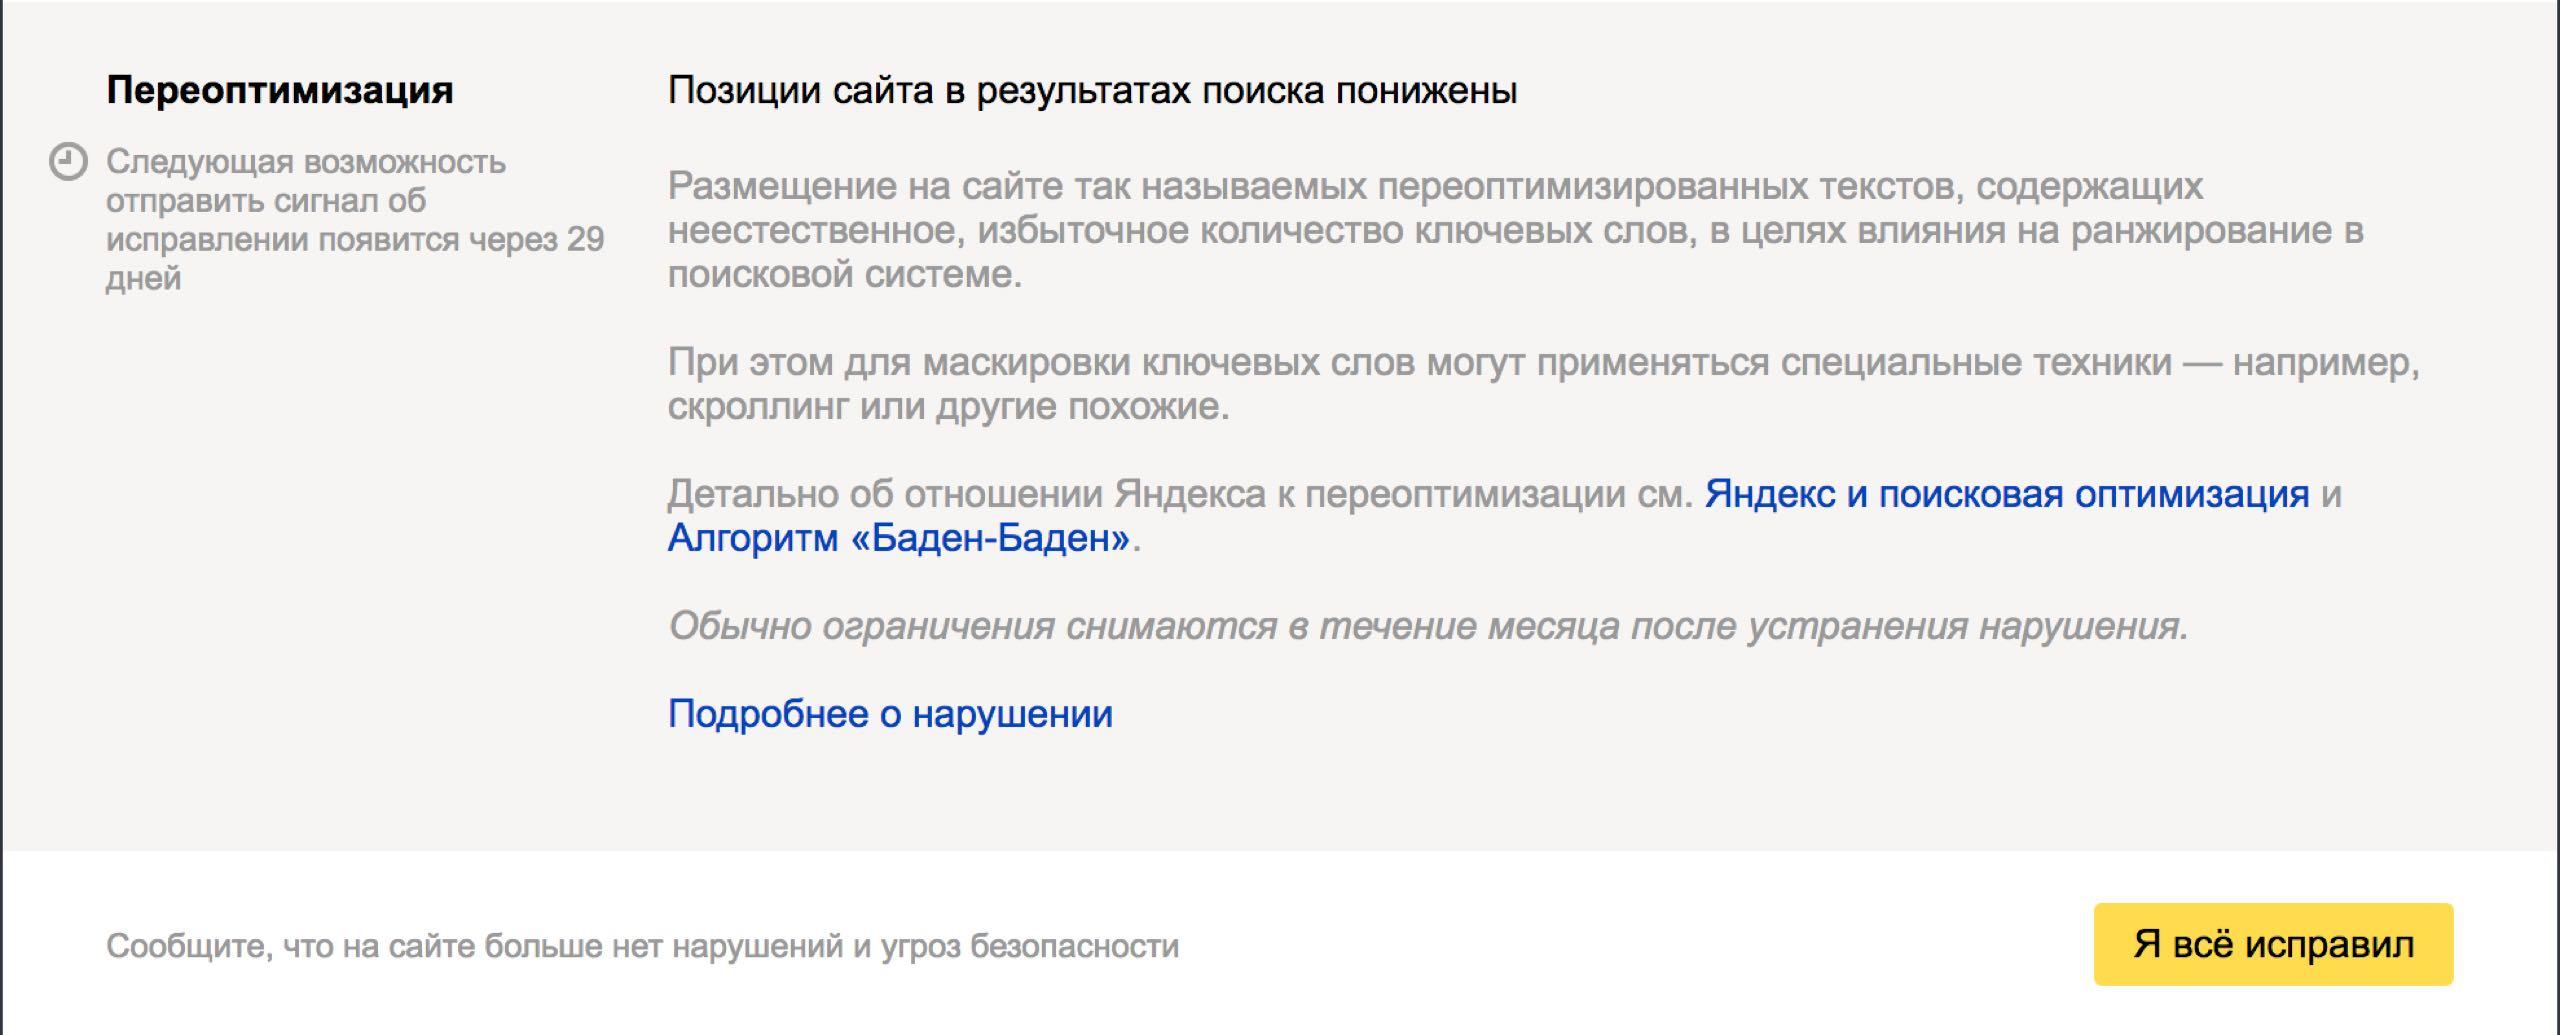 Оповещения о санкциях из-за алгоритма Баден-Баден появились в Яндекс.Вебмастере